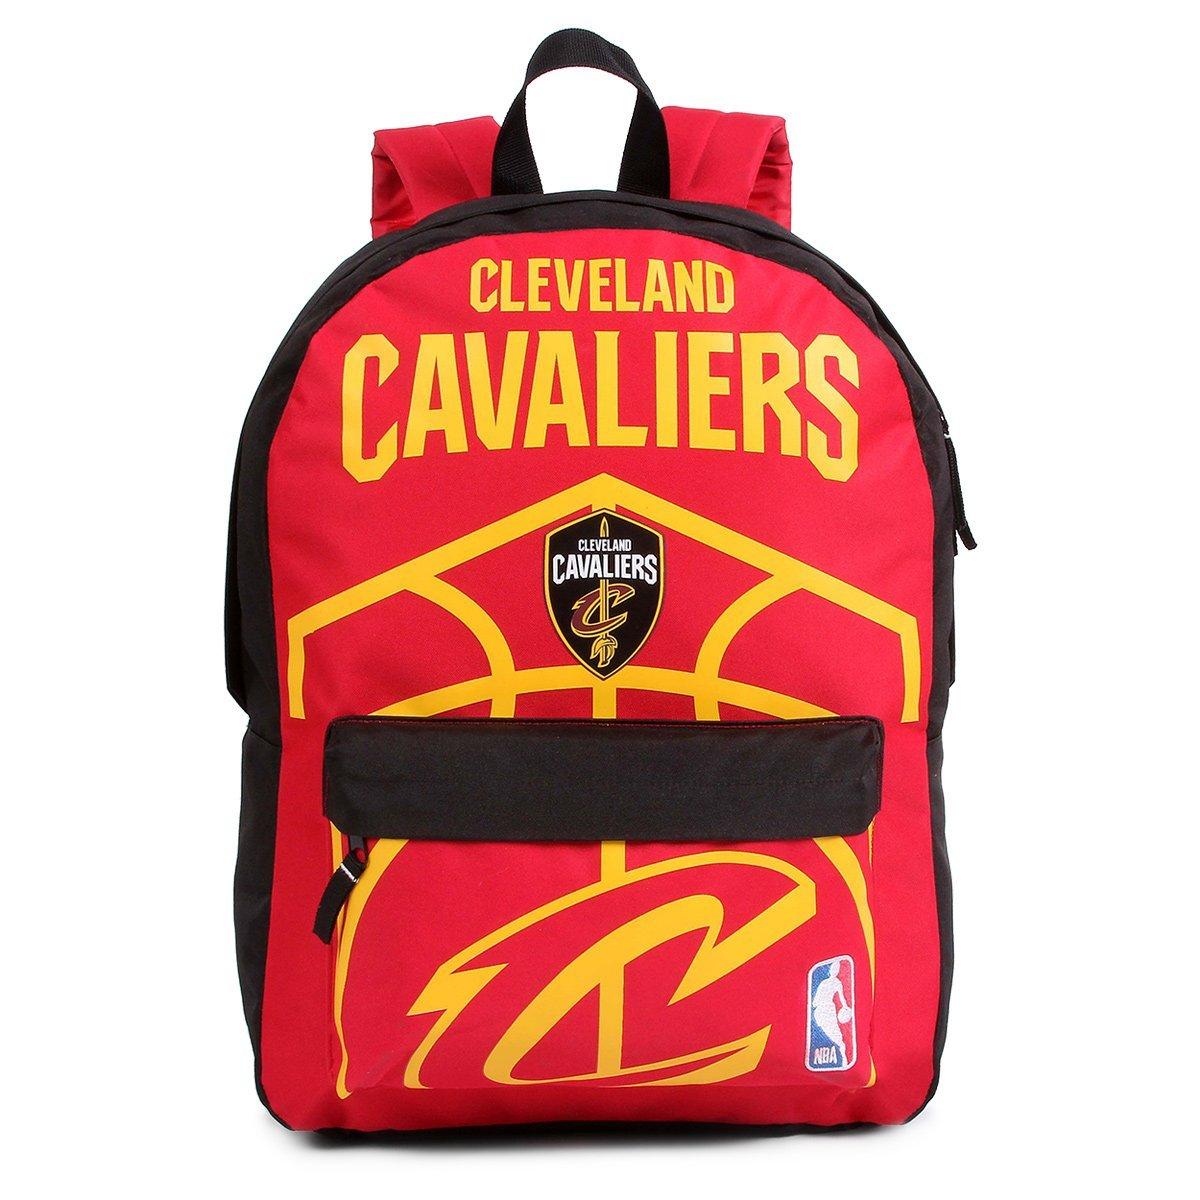 Mochila do Cleveland Cavaliers